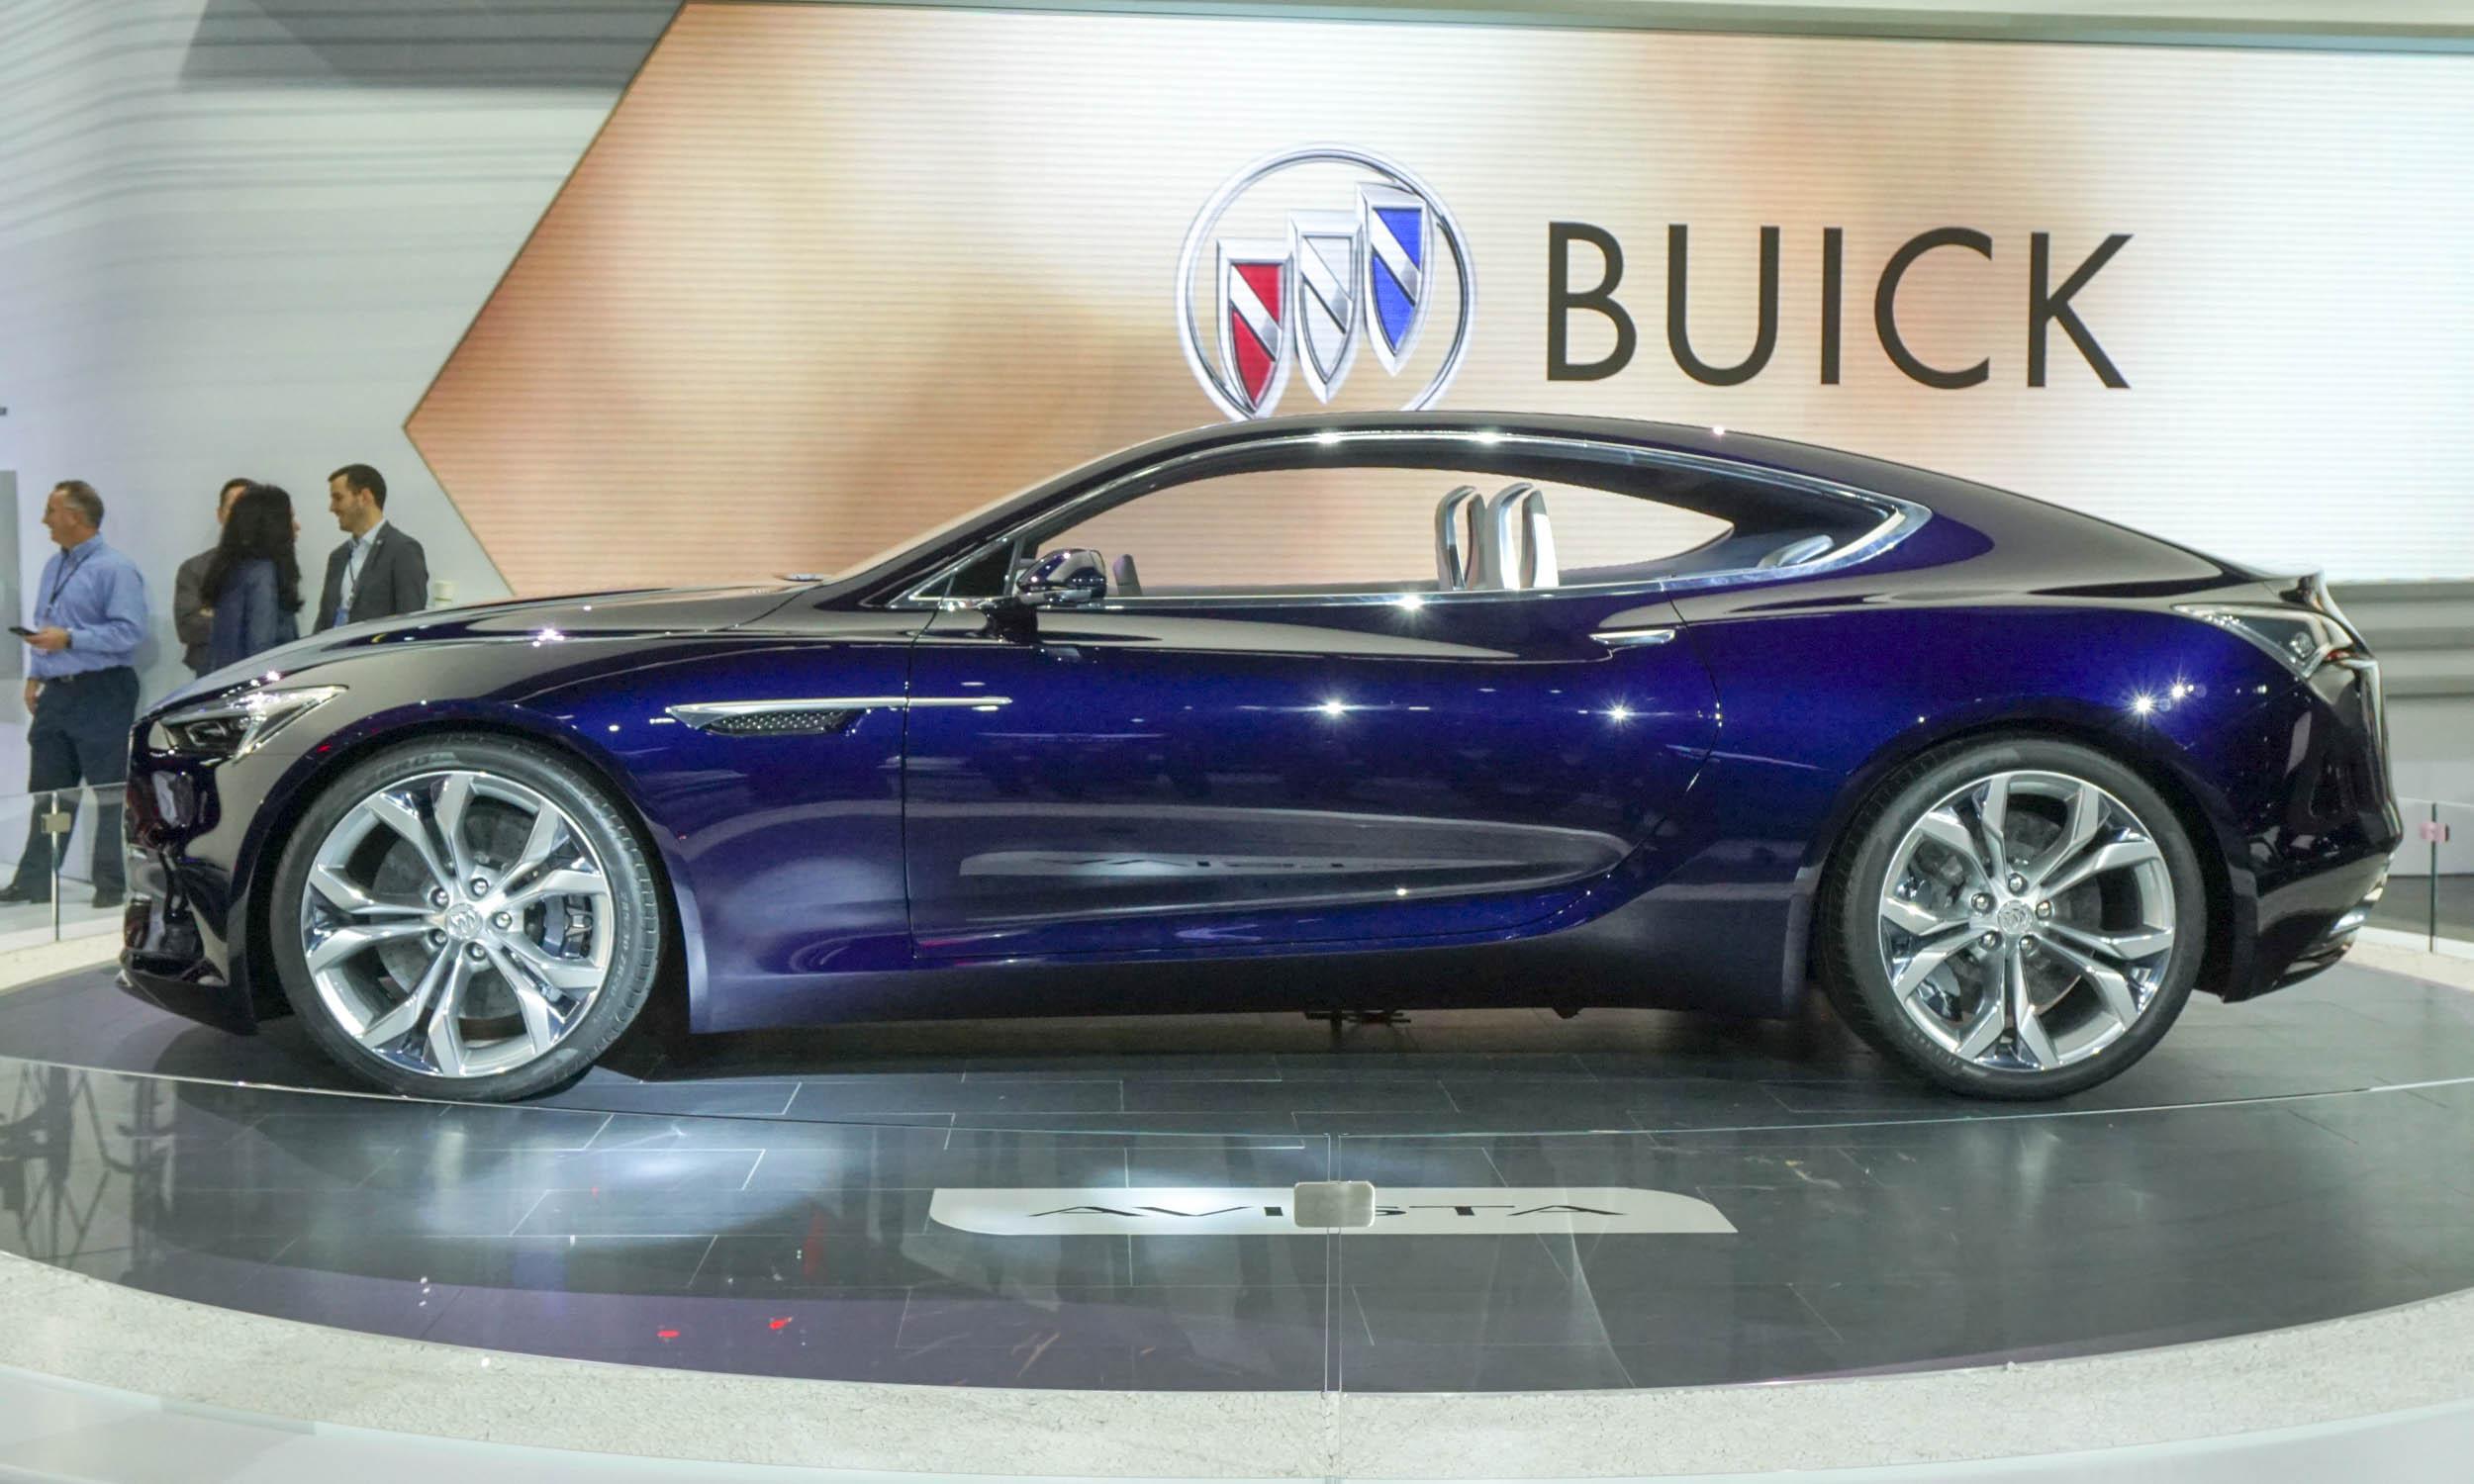 Image 9 Of 48 Buick Avista Concept Debuts In Detroit Gm 1951 Xp 300 Car 2018 Auto Show Highlights Automotive Content